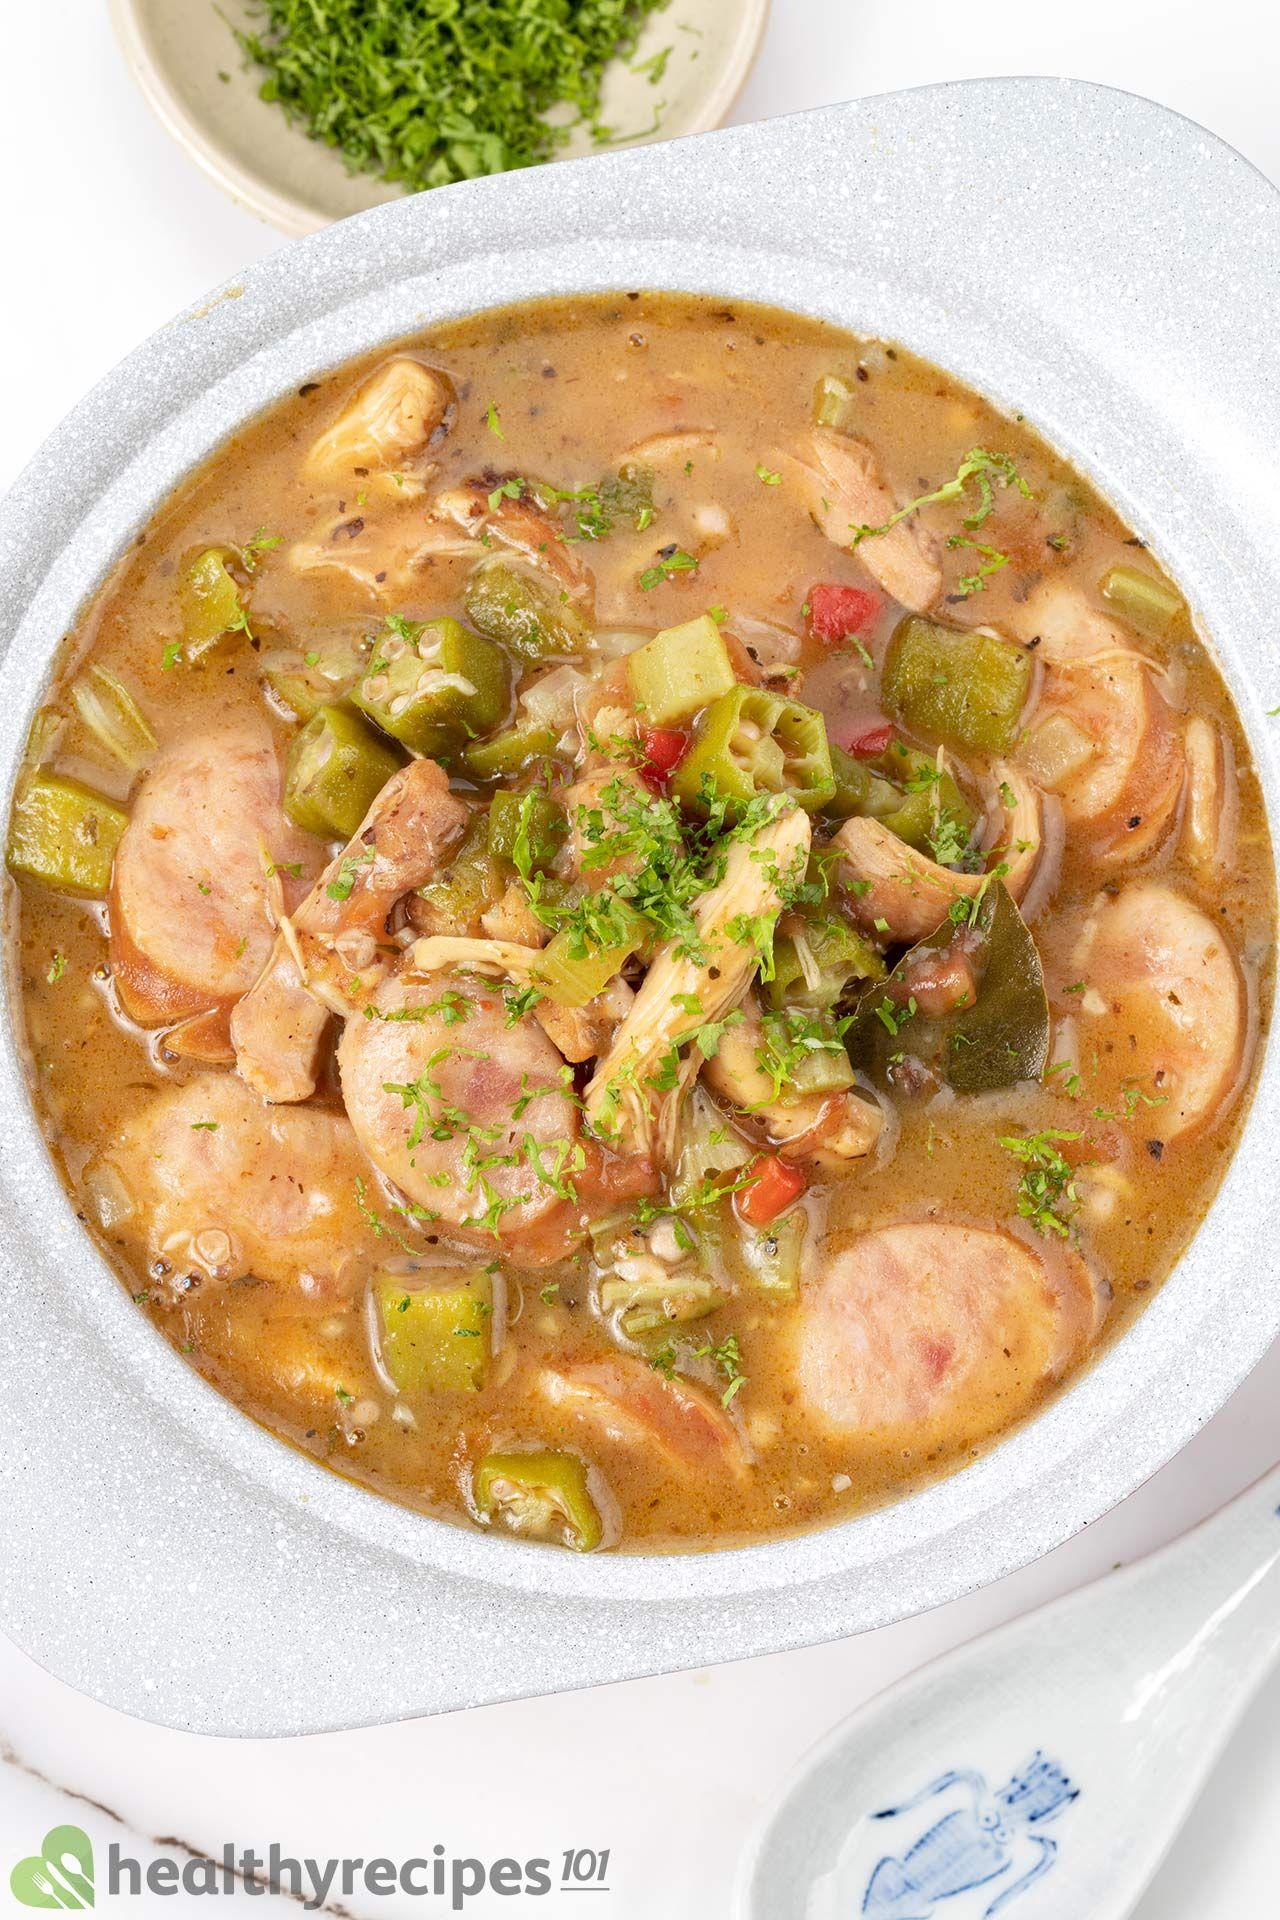 Homemade Chicken and Sausage Gumbo Recipe